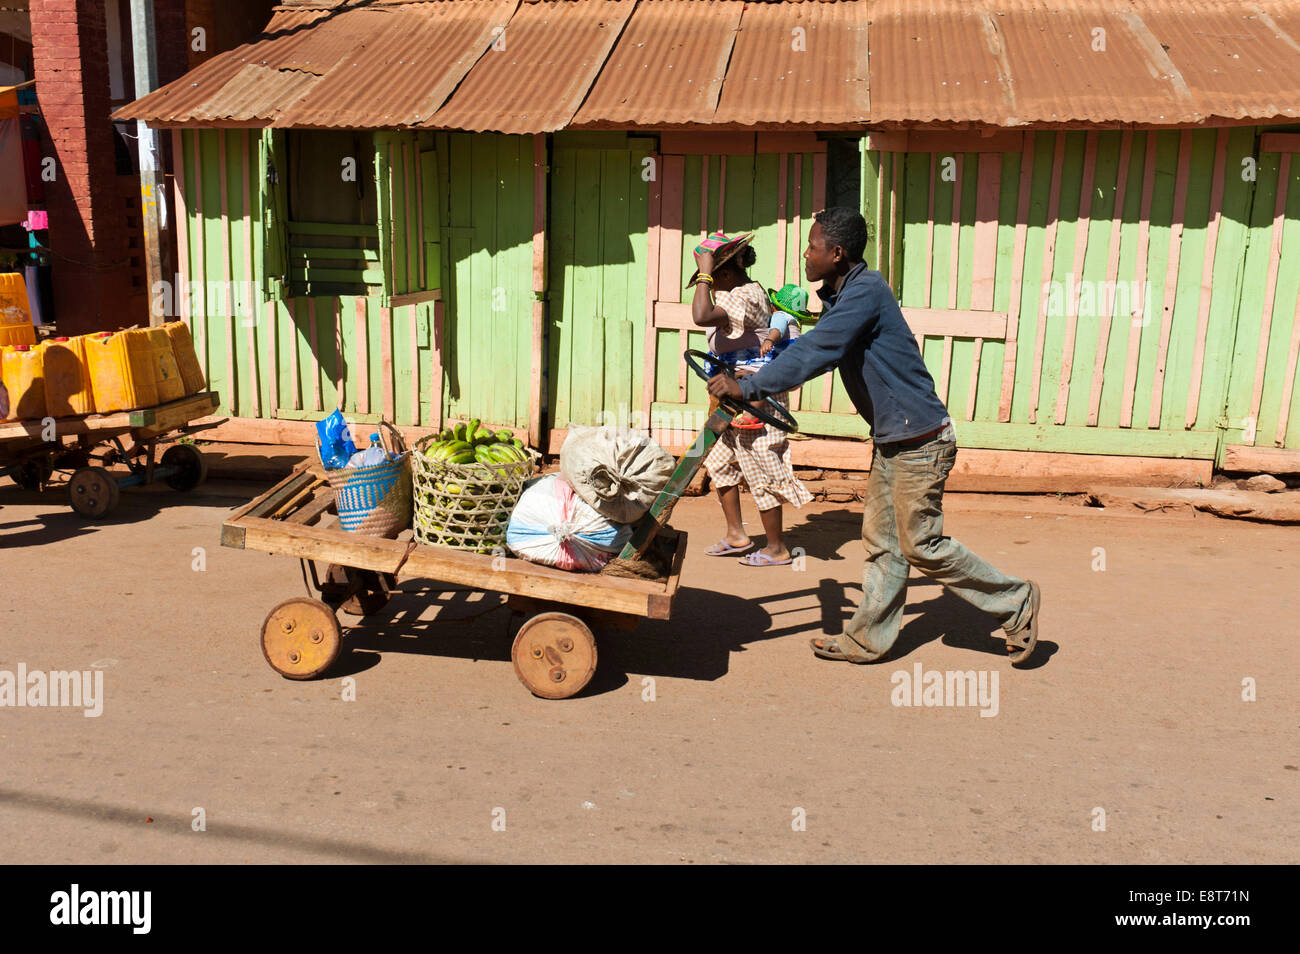 Man pushes goods on a home-made cart, Ambalavao, Madagascar Stock Photo